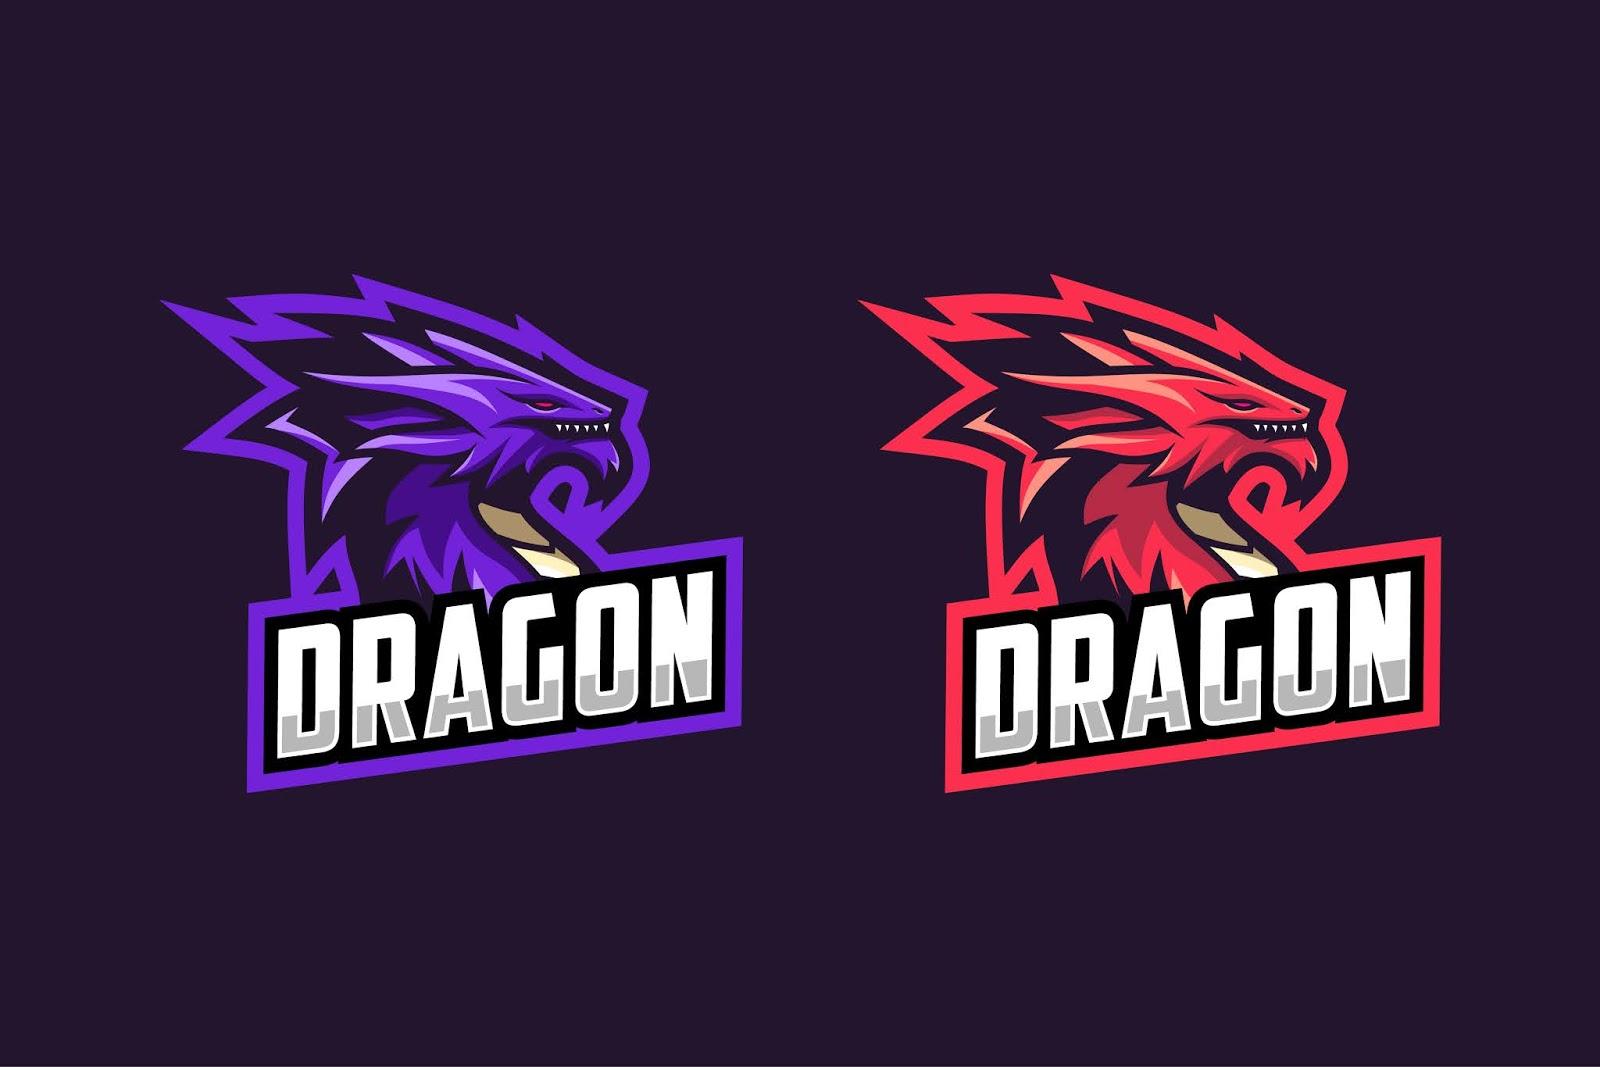 Gasmask Mascot Logo Esport Design Free Download Vector CDR, AI, EPS and PNG Formats